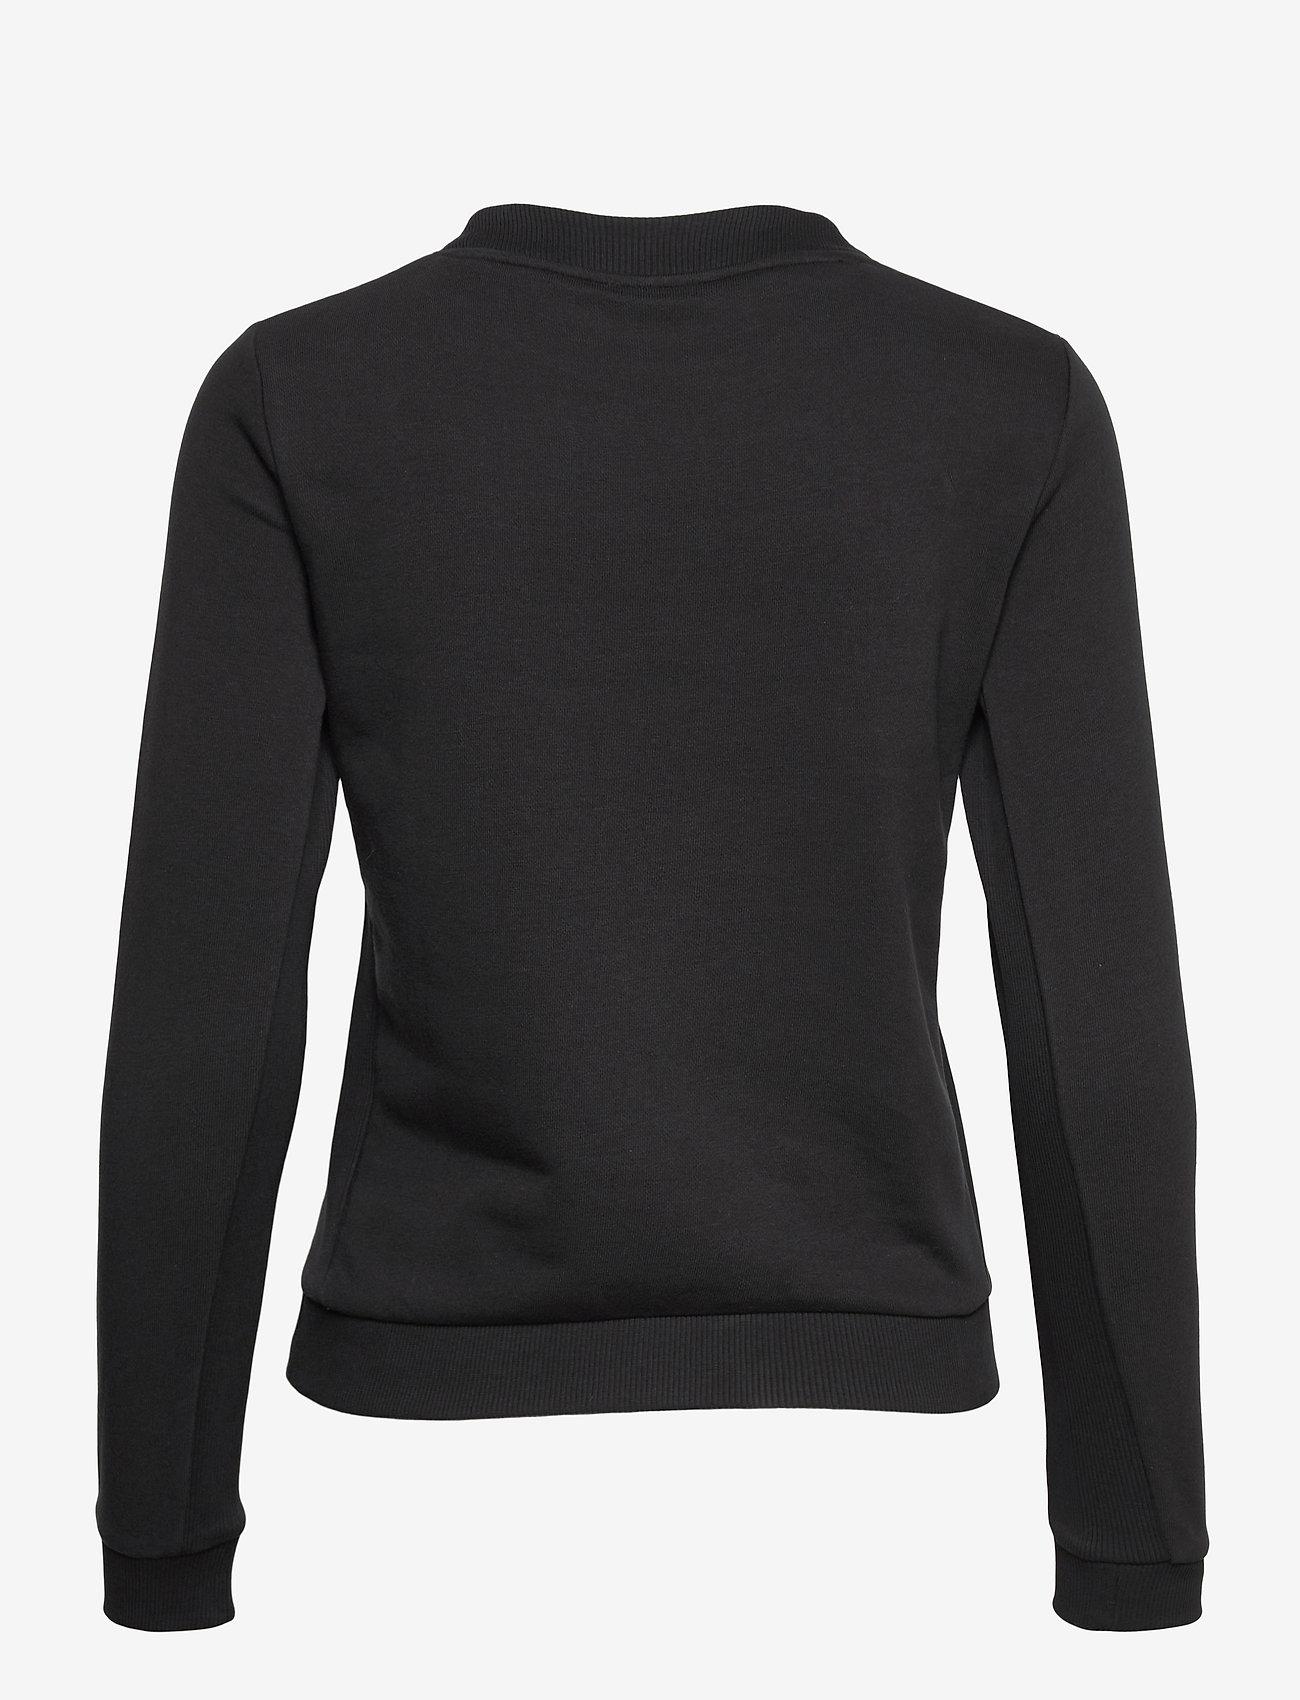 Lacoste - Women s sweatshirt - sweatshirts - black - 1